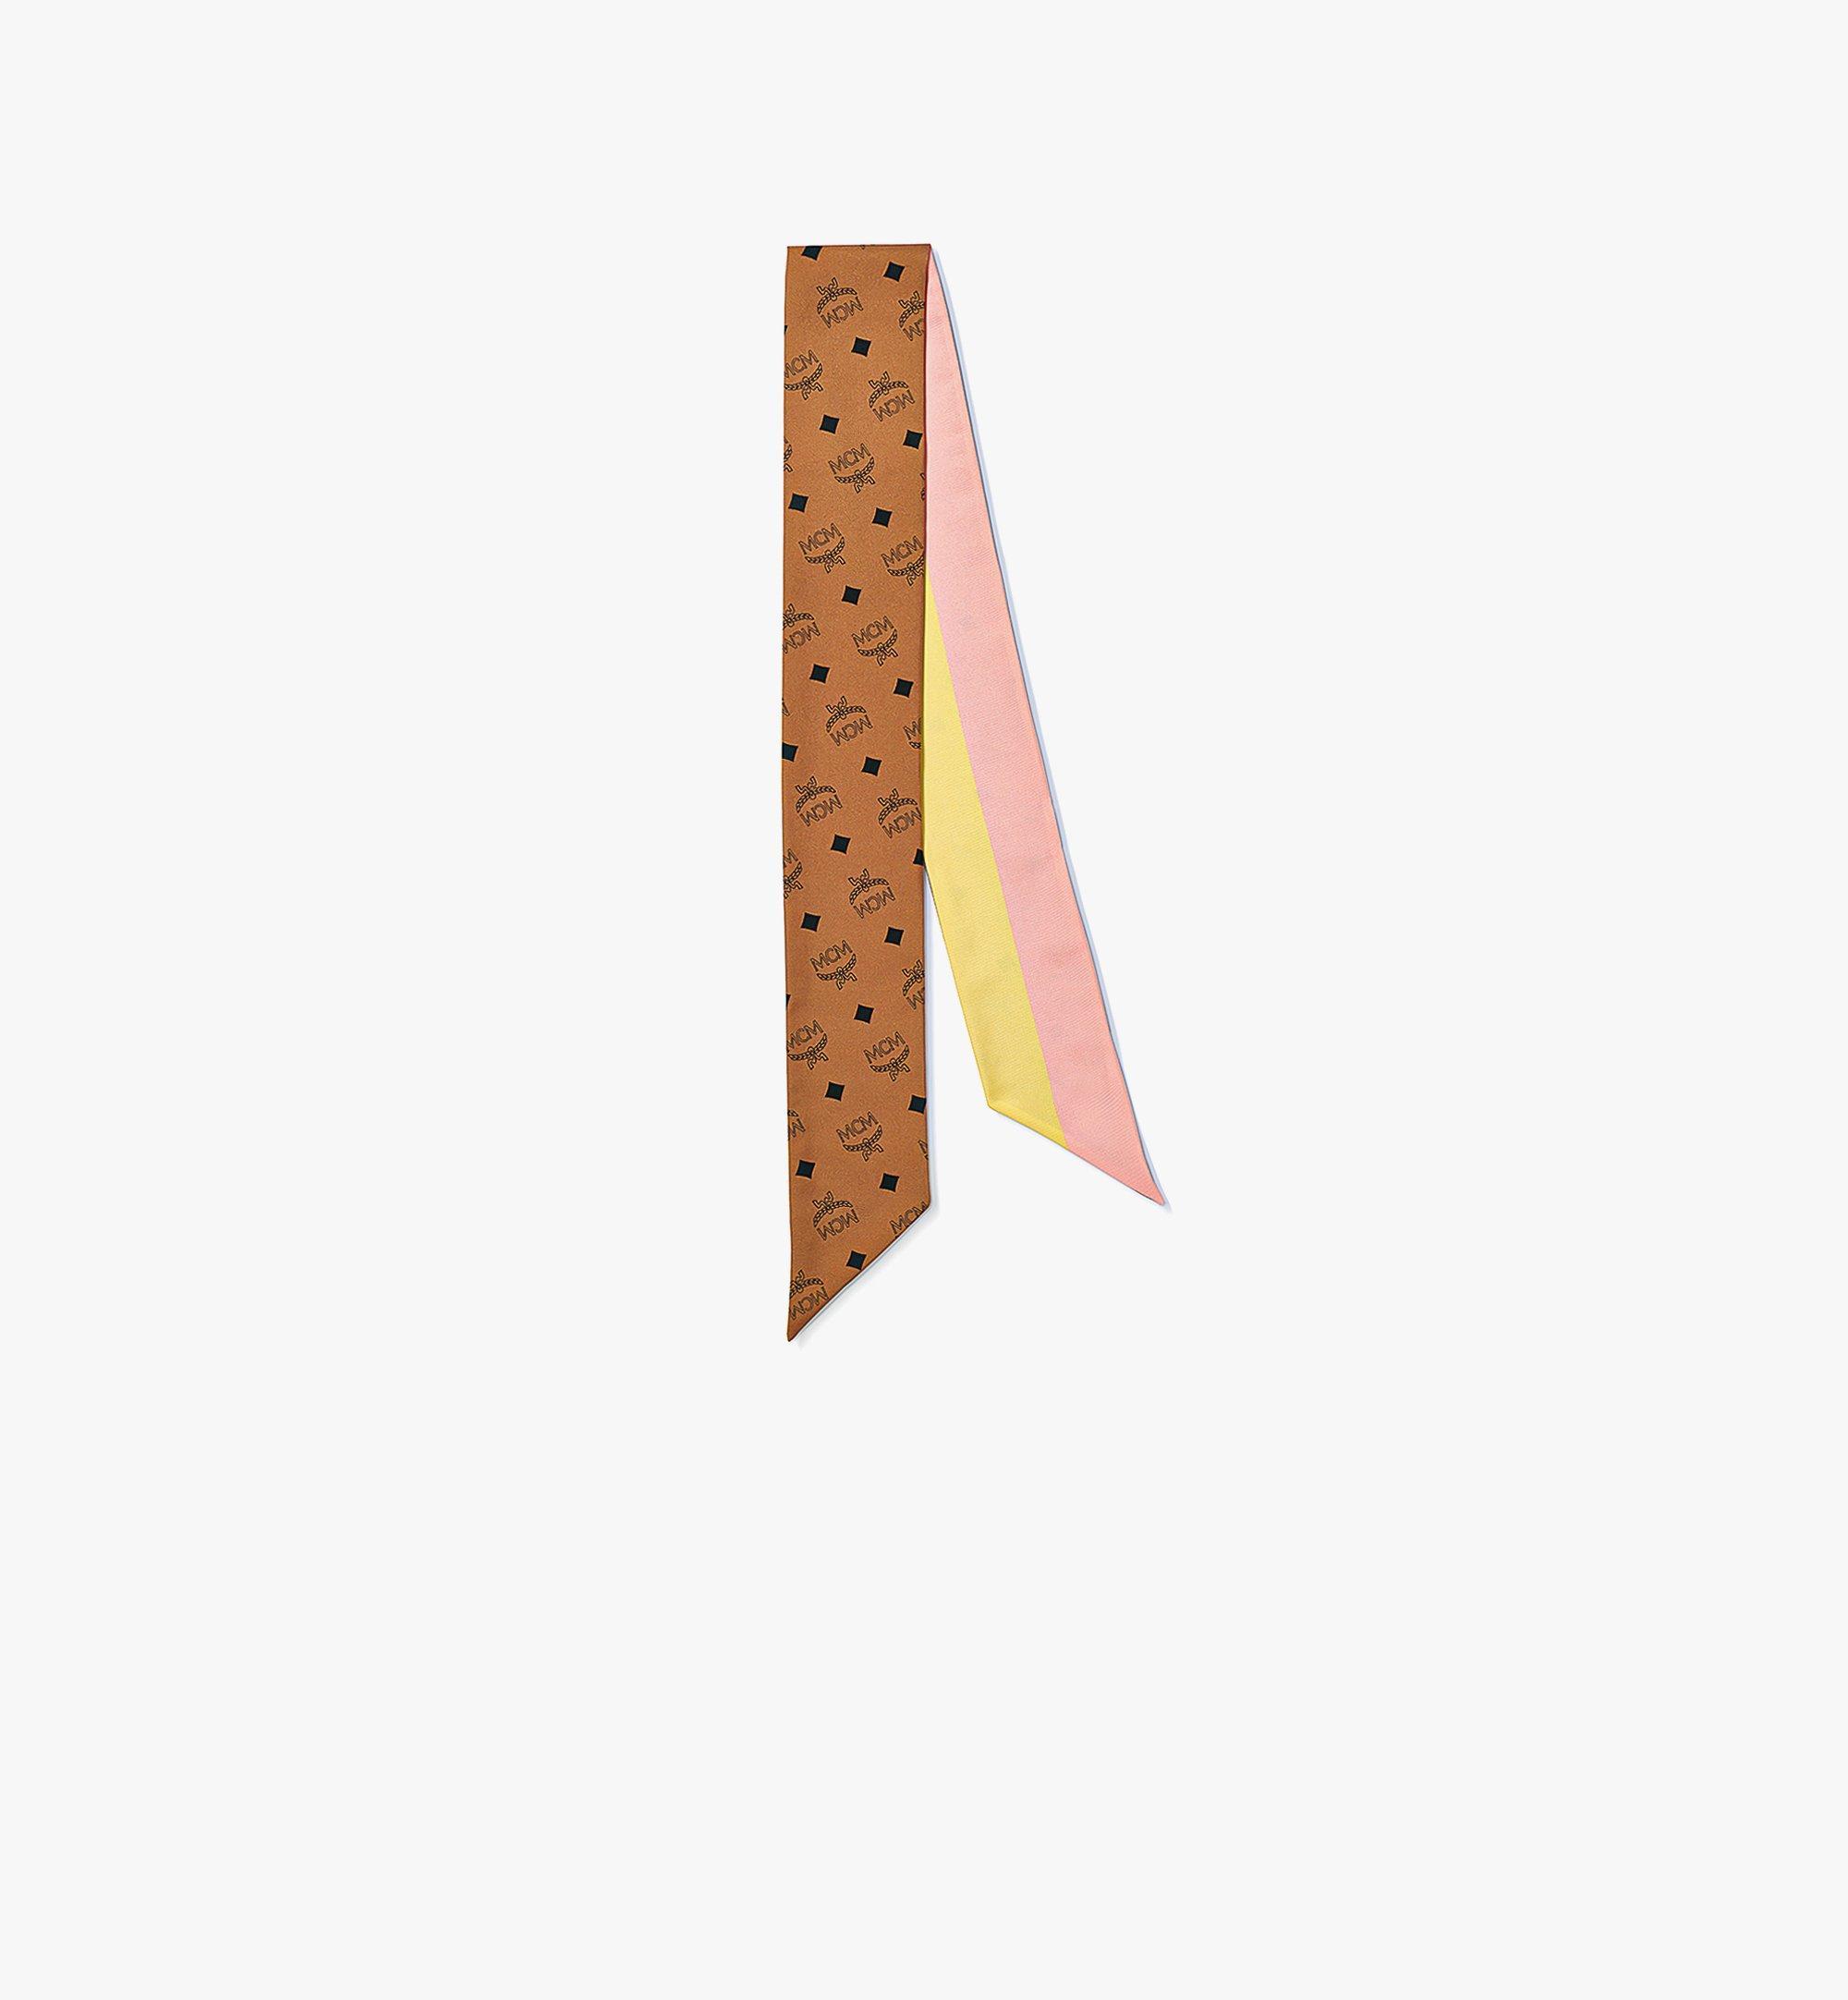 MCM 縮寫字母圖案絲質斜紋圍巾 Cognac MEFBSMM11CO001 更多視圖 1